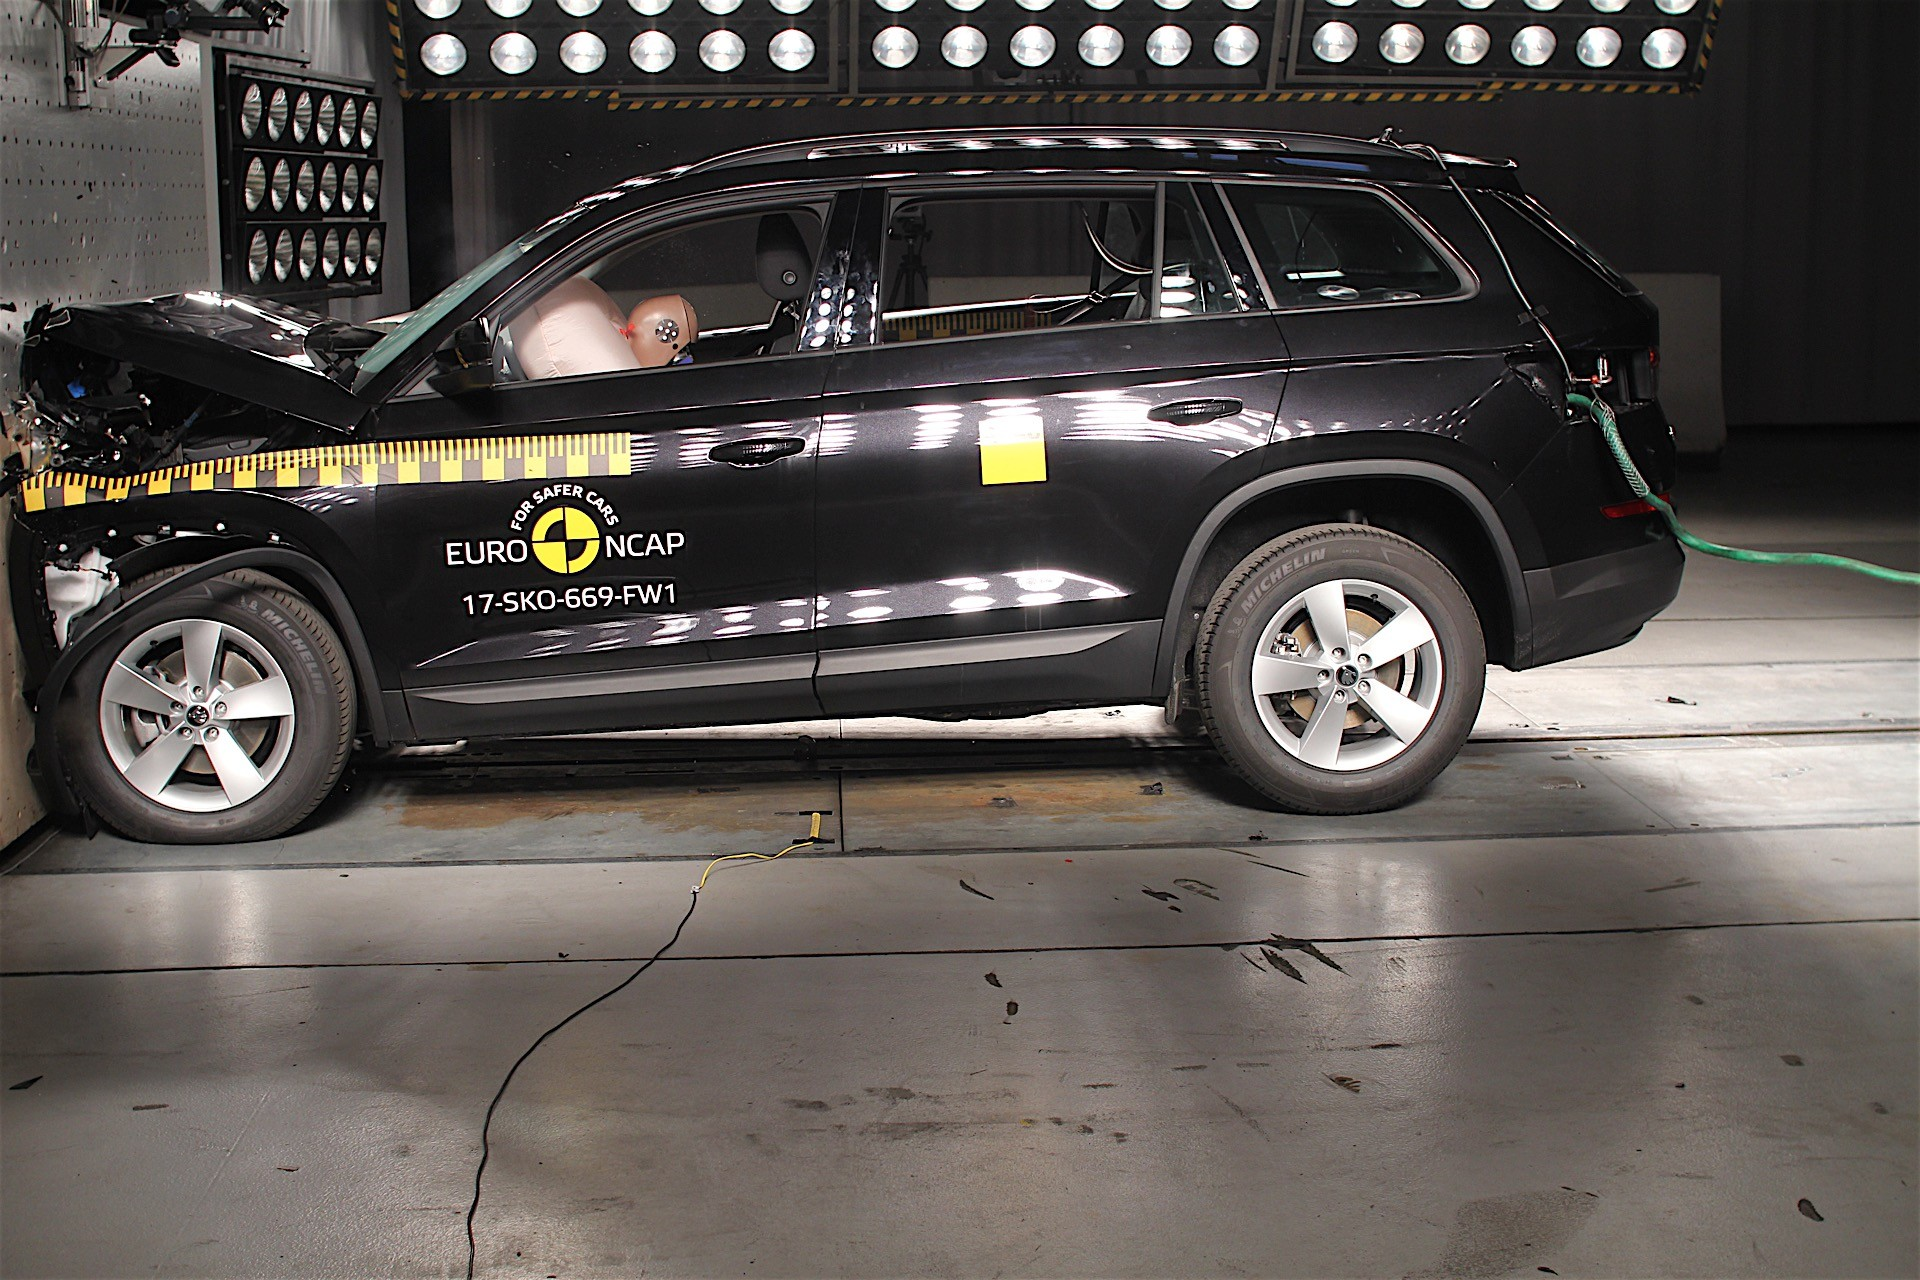 Euro NCAP crash tests may 2017 (2)